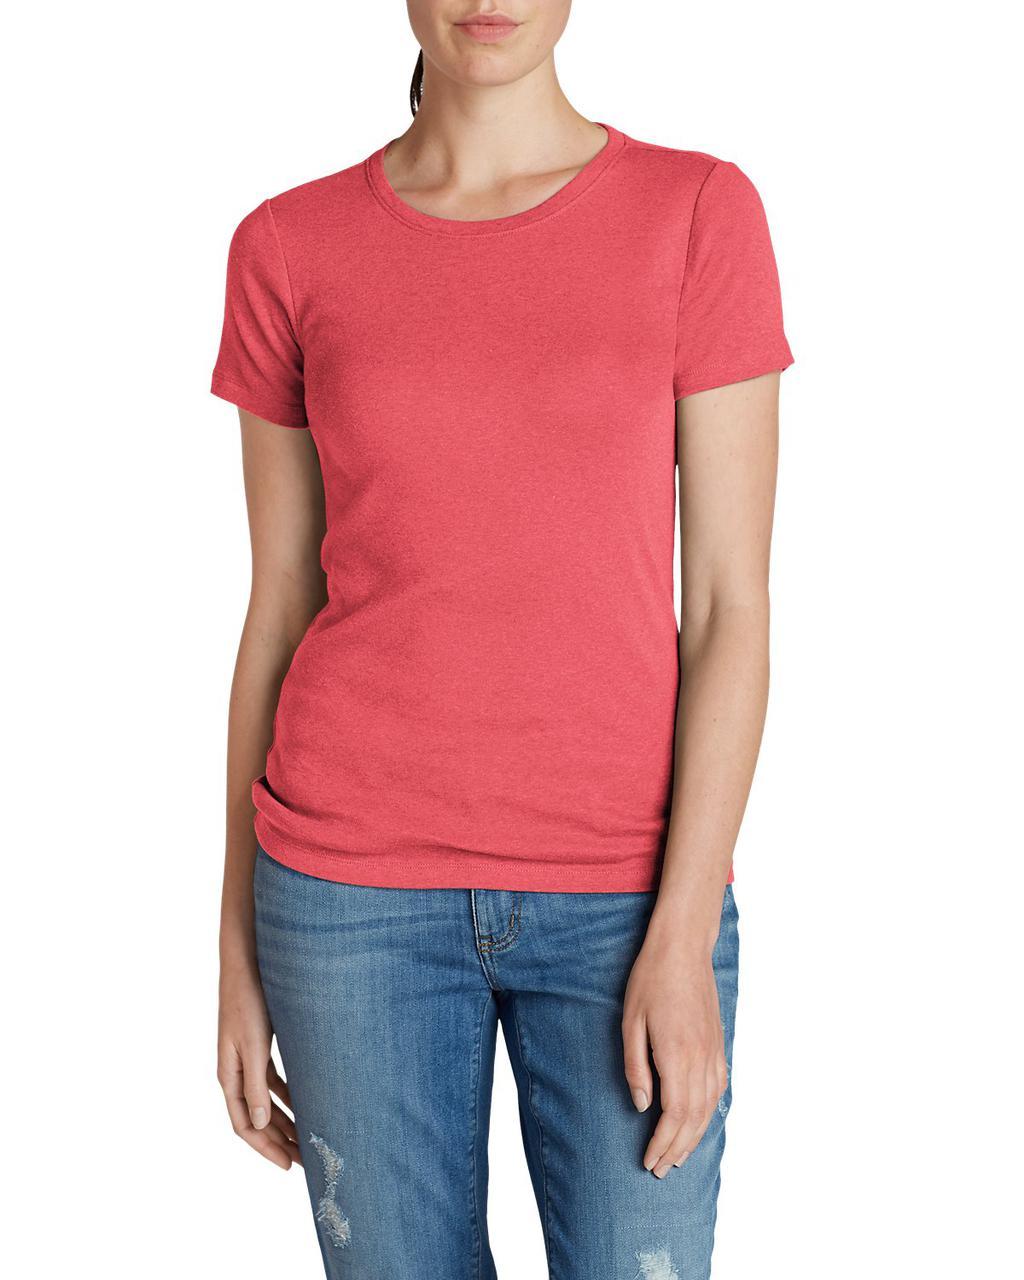 Футболка Eddie Bauer Favorite Short-Sleeve Crewneck T-Shirt S